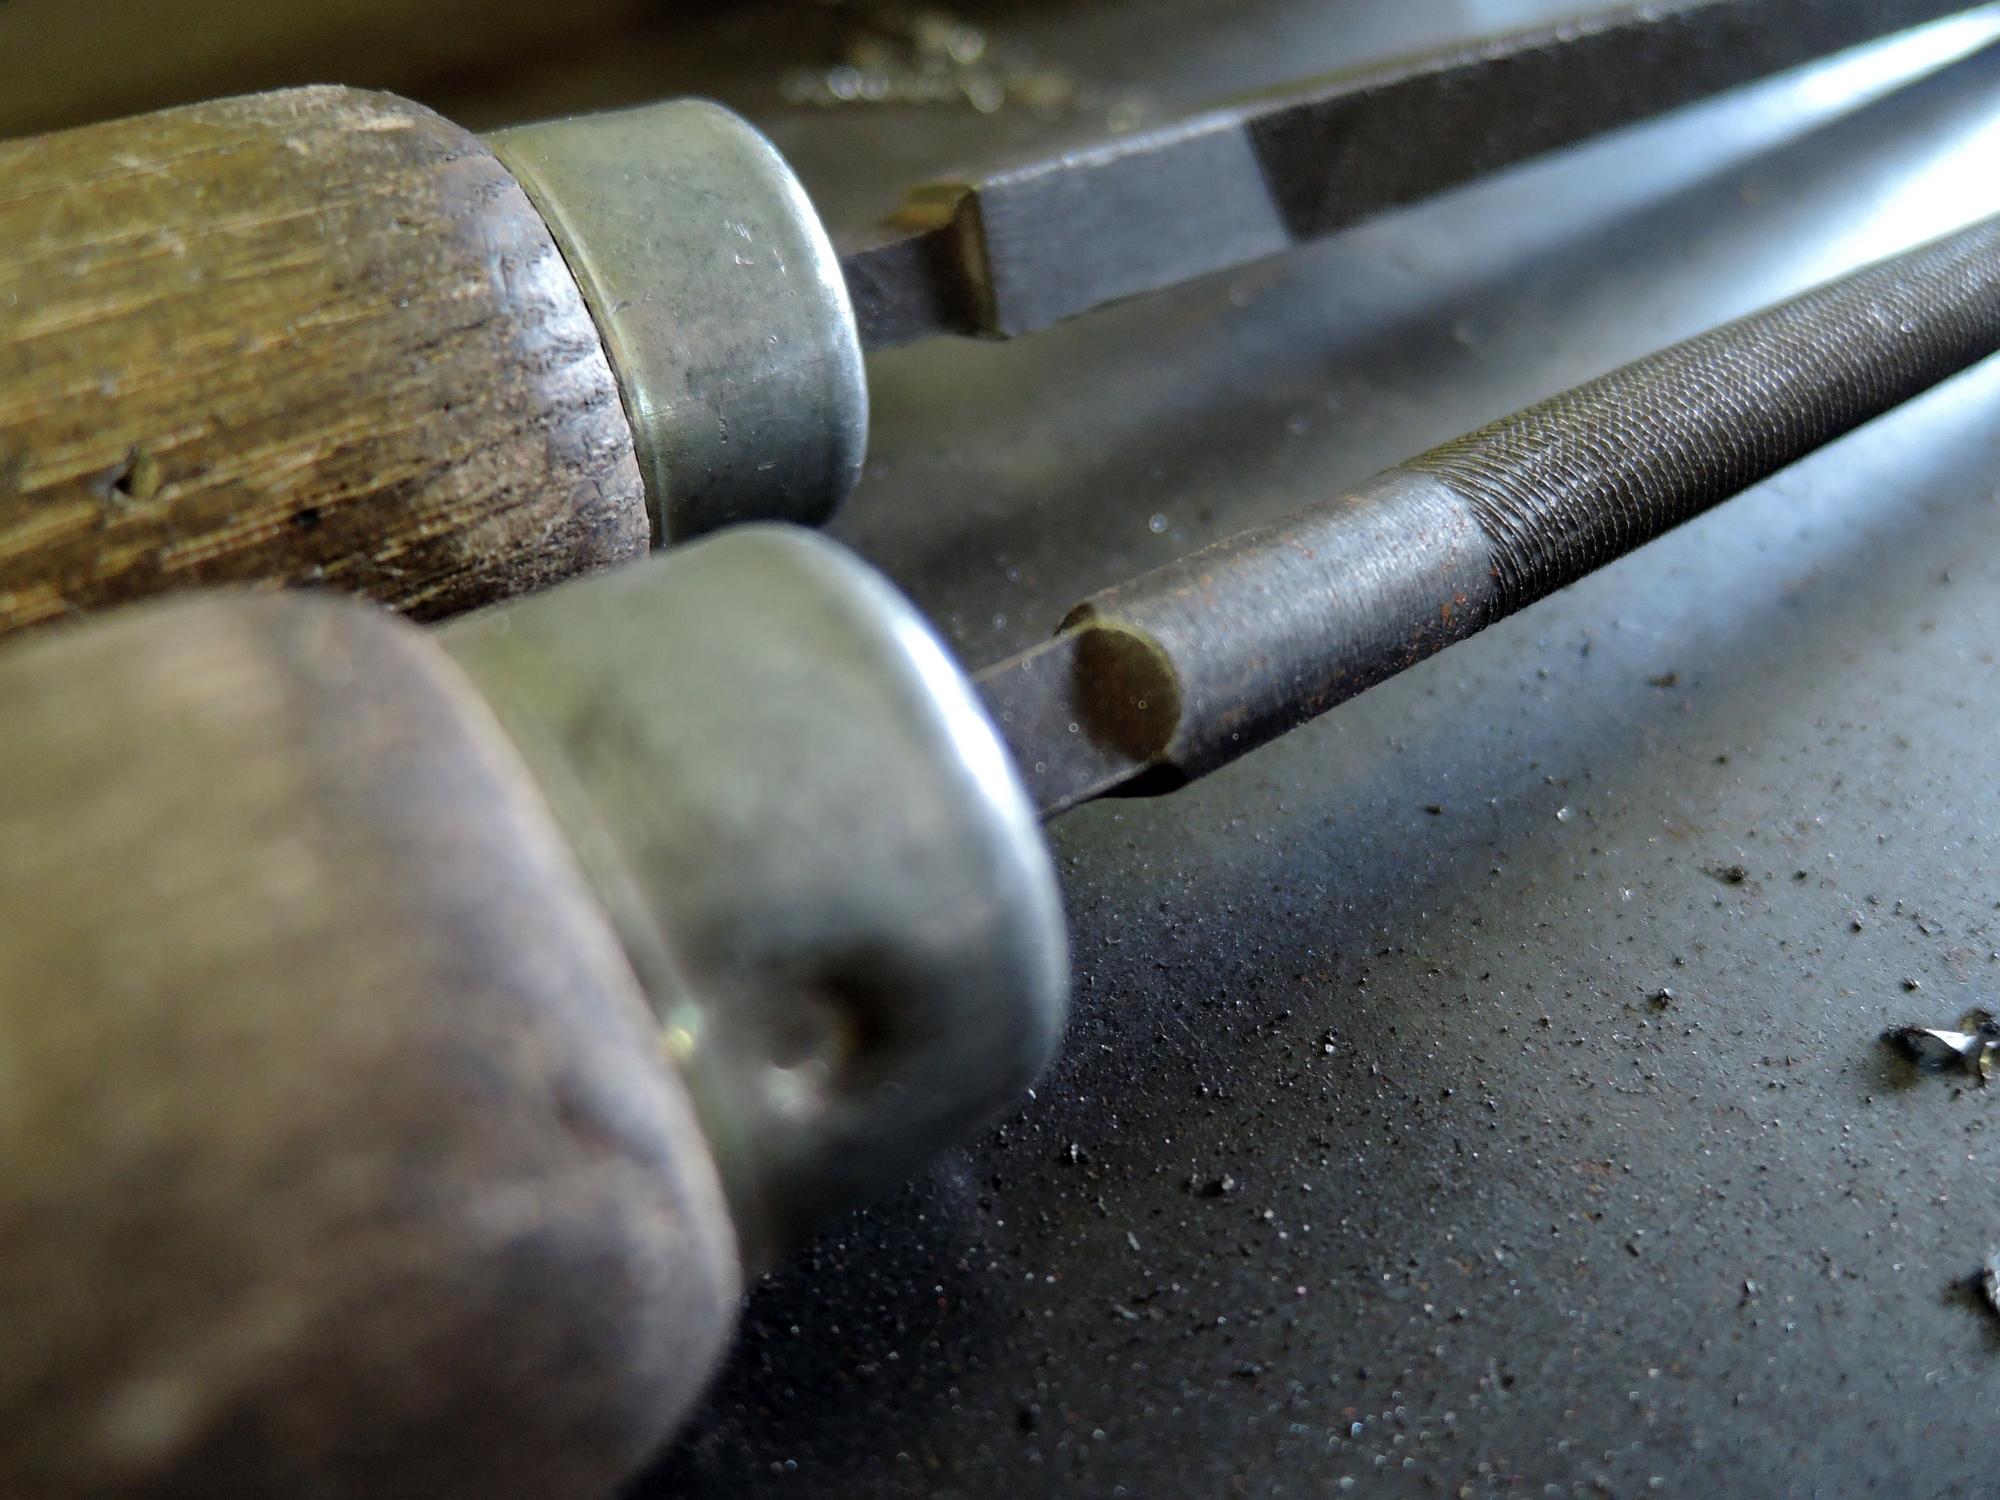 ARTMETA fabrication artisanale atelier en normandie / meuble éco-responsable